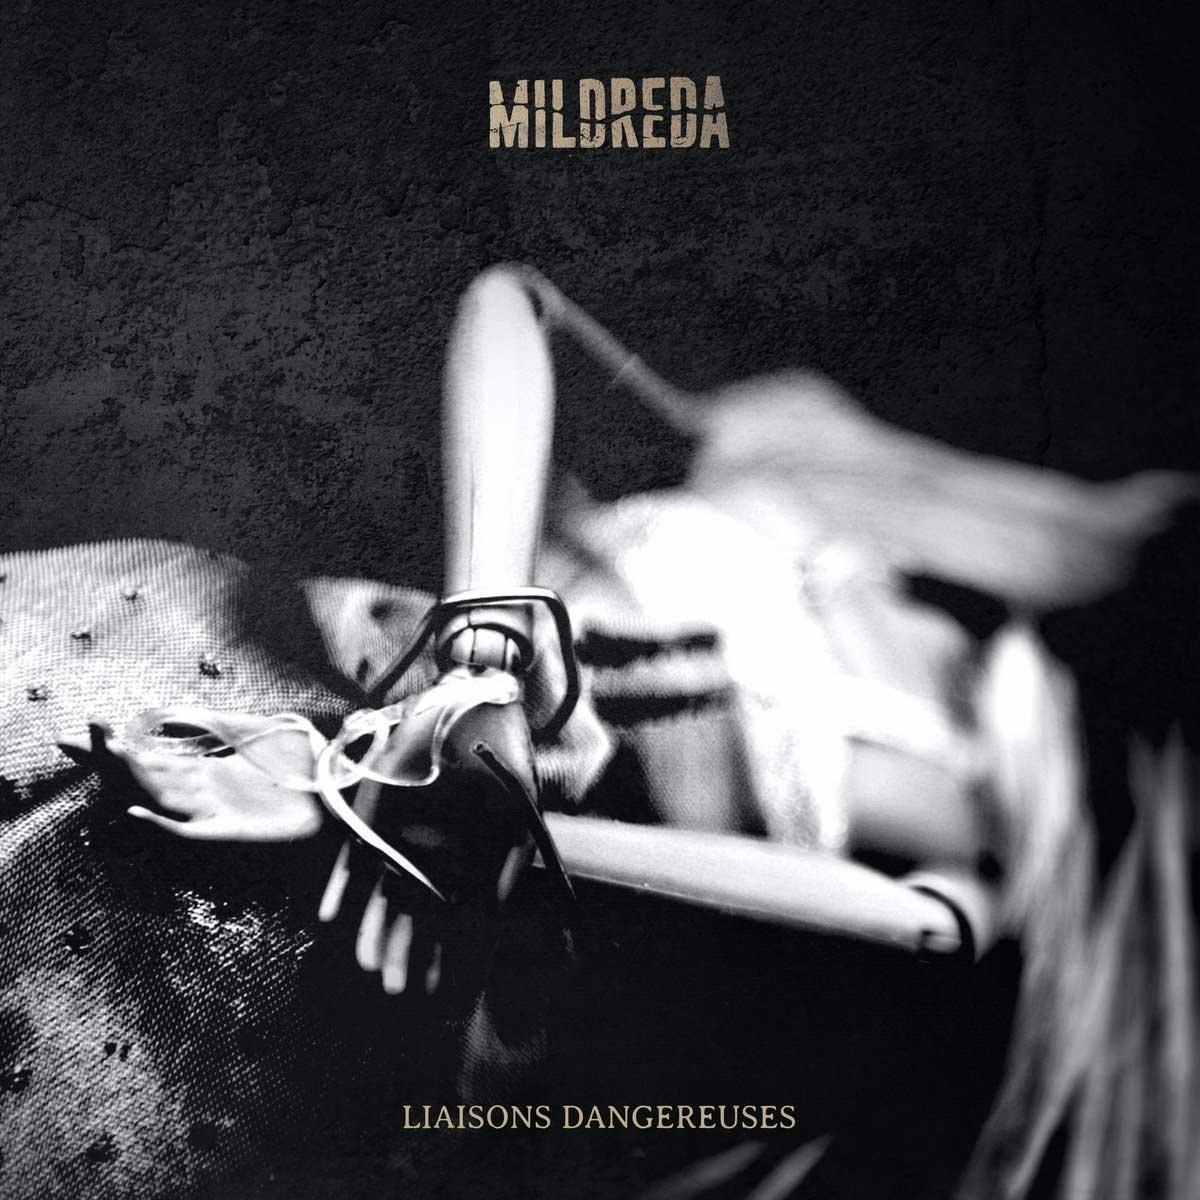 Mildreda - Liaisons Dangereuses - Mildreda - Liaisons Dangereuses